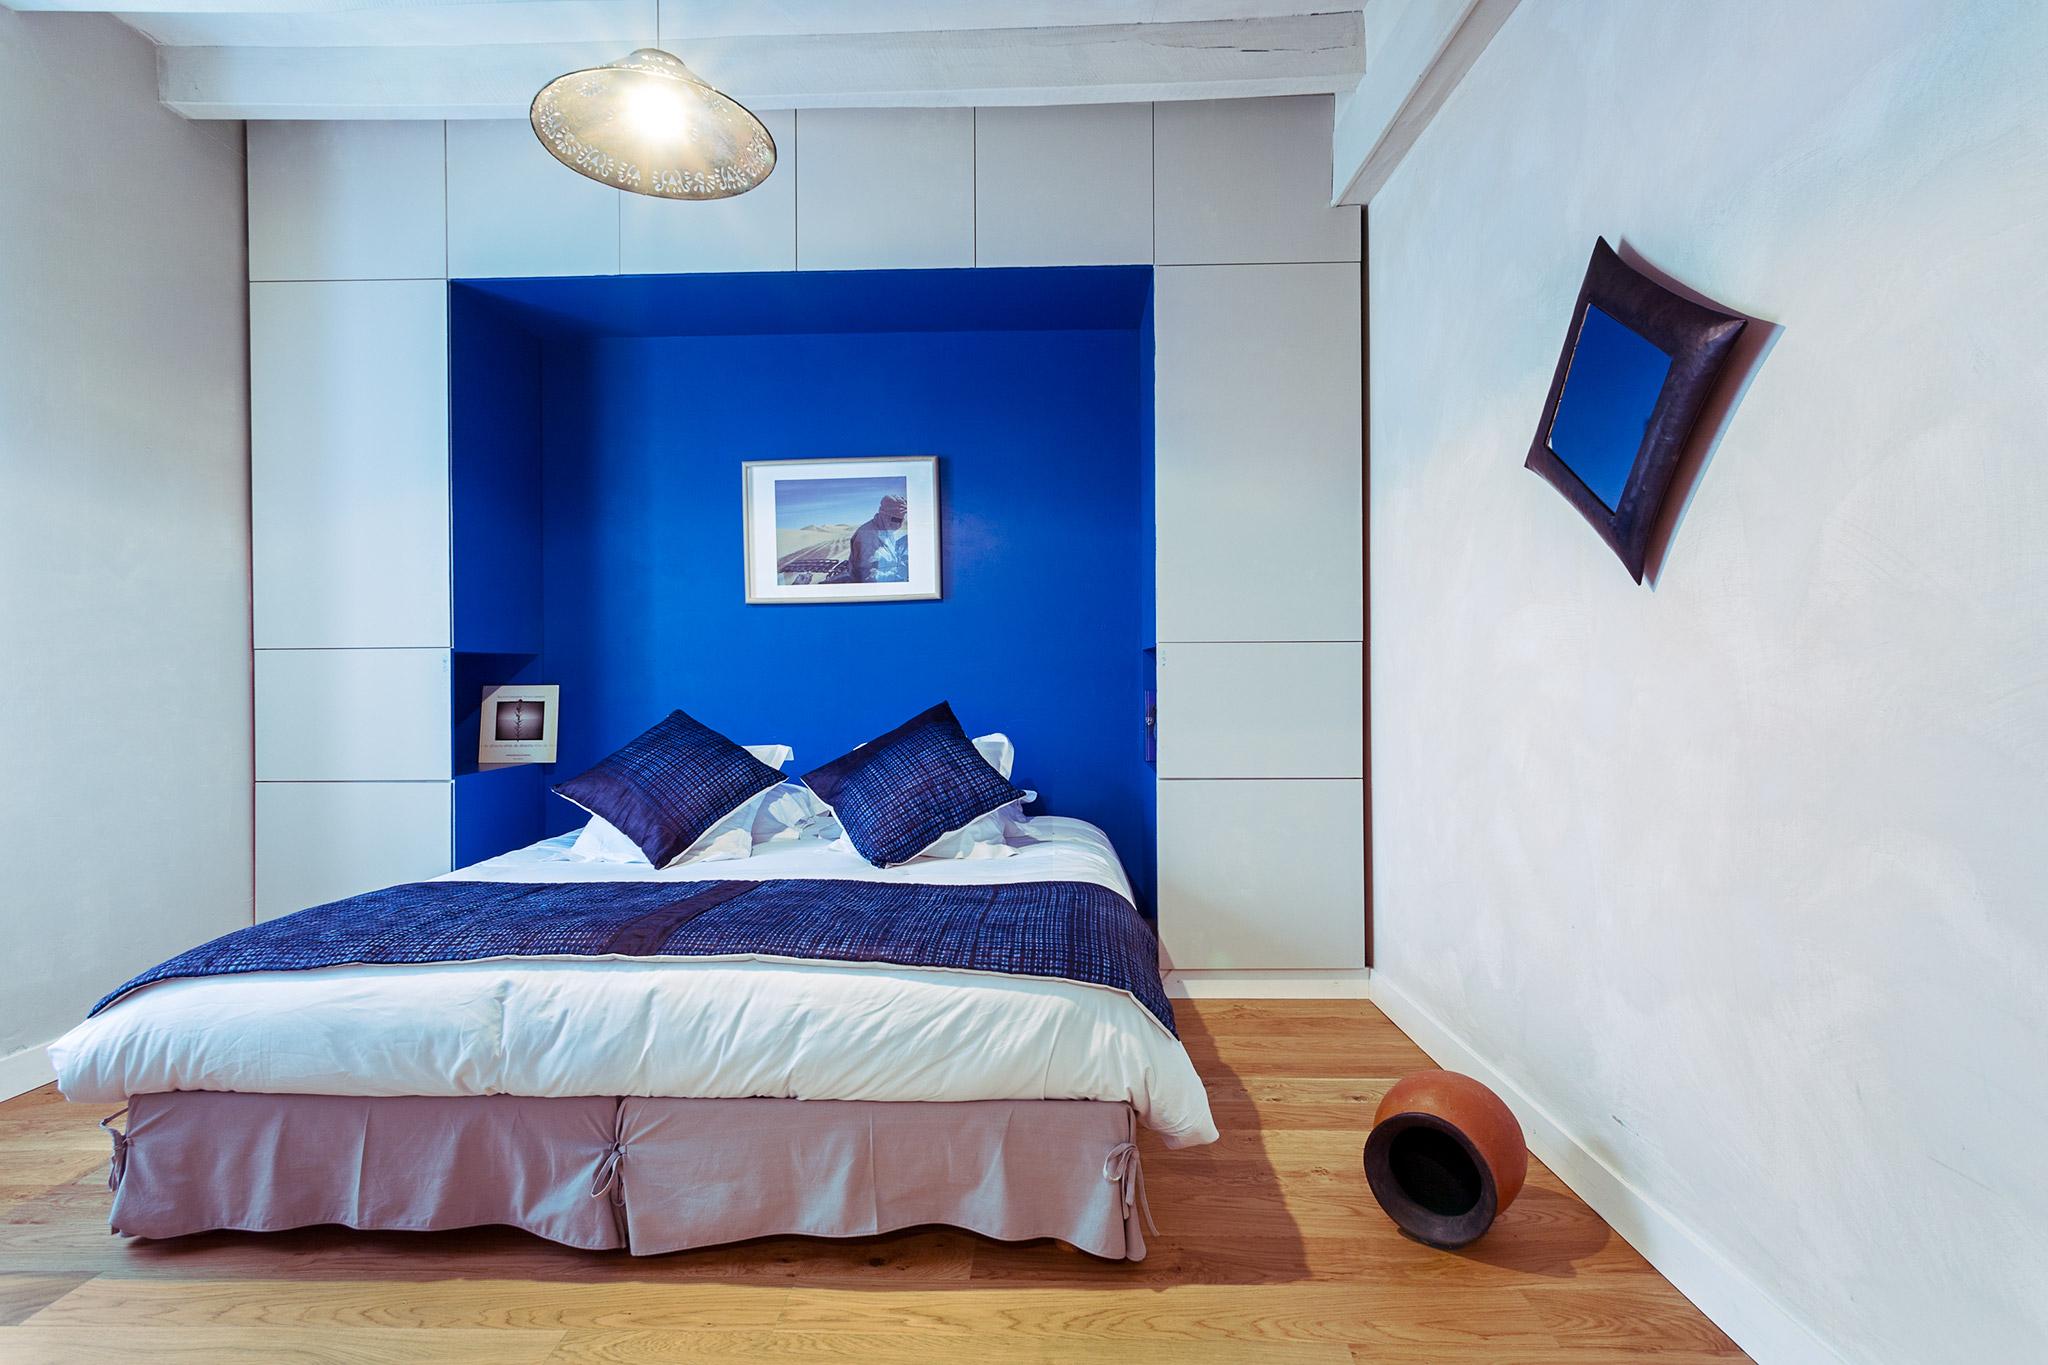 Awesome decor photo chambres d hotes pictures design - Decor de chambre ...